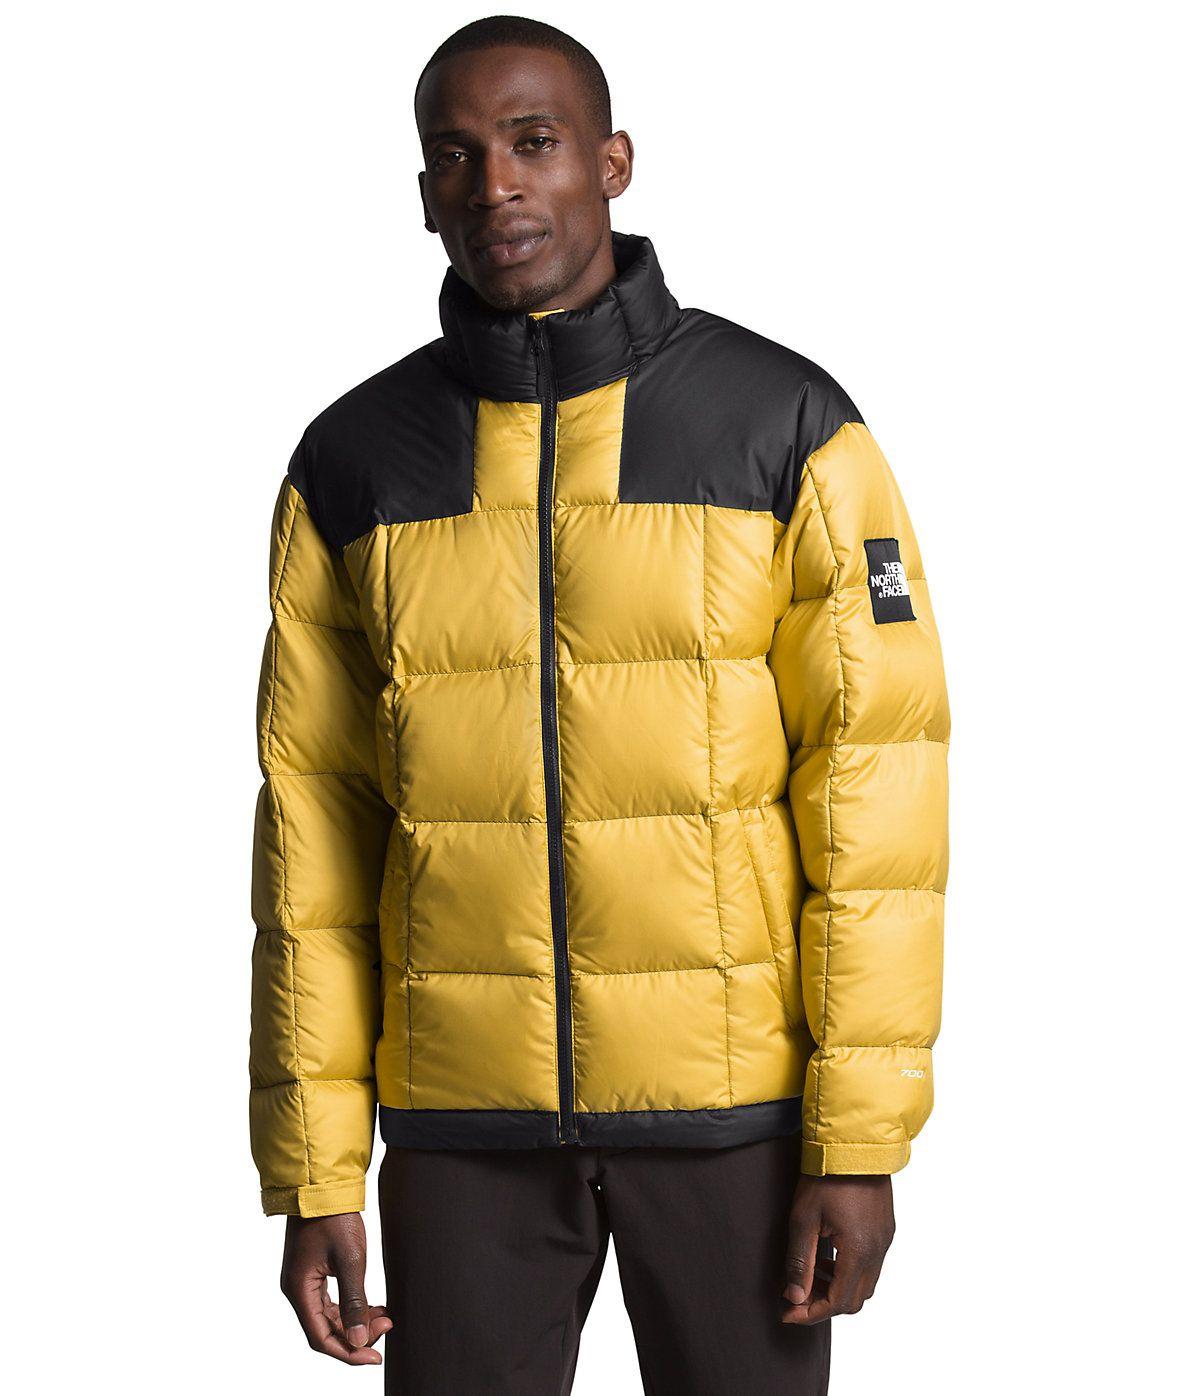 Men S Lhotse Jacket Eu Free Shipping The North Face In 2021 North Face Jacket Mens North Face Parka Jackets [ 1396 x 1200 Pixel ]